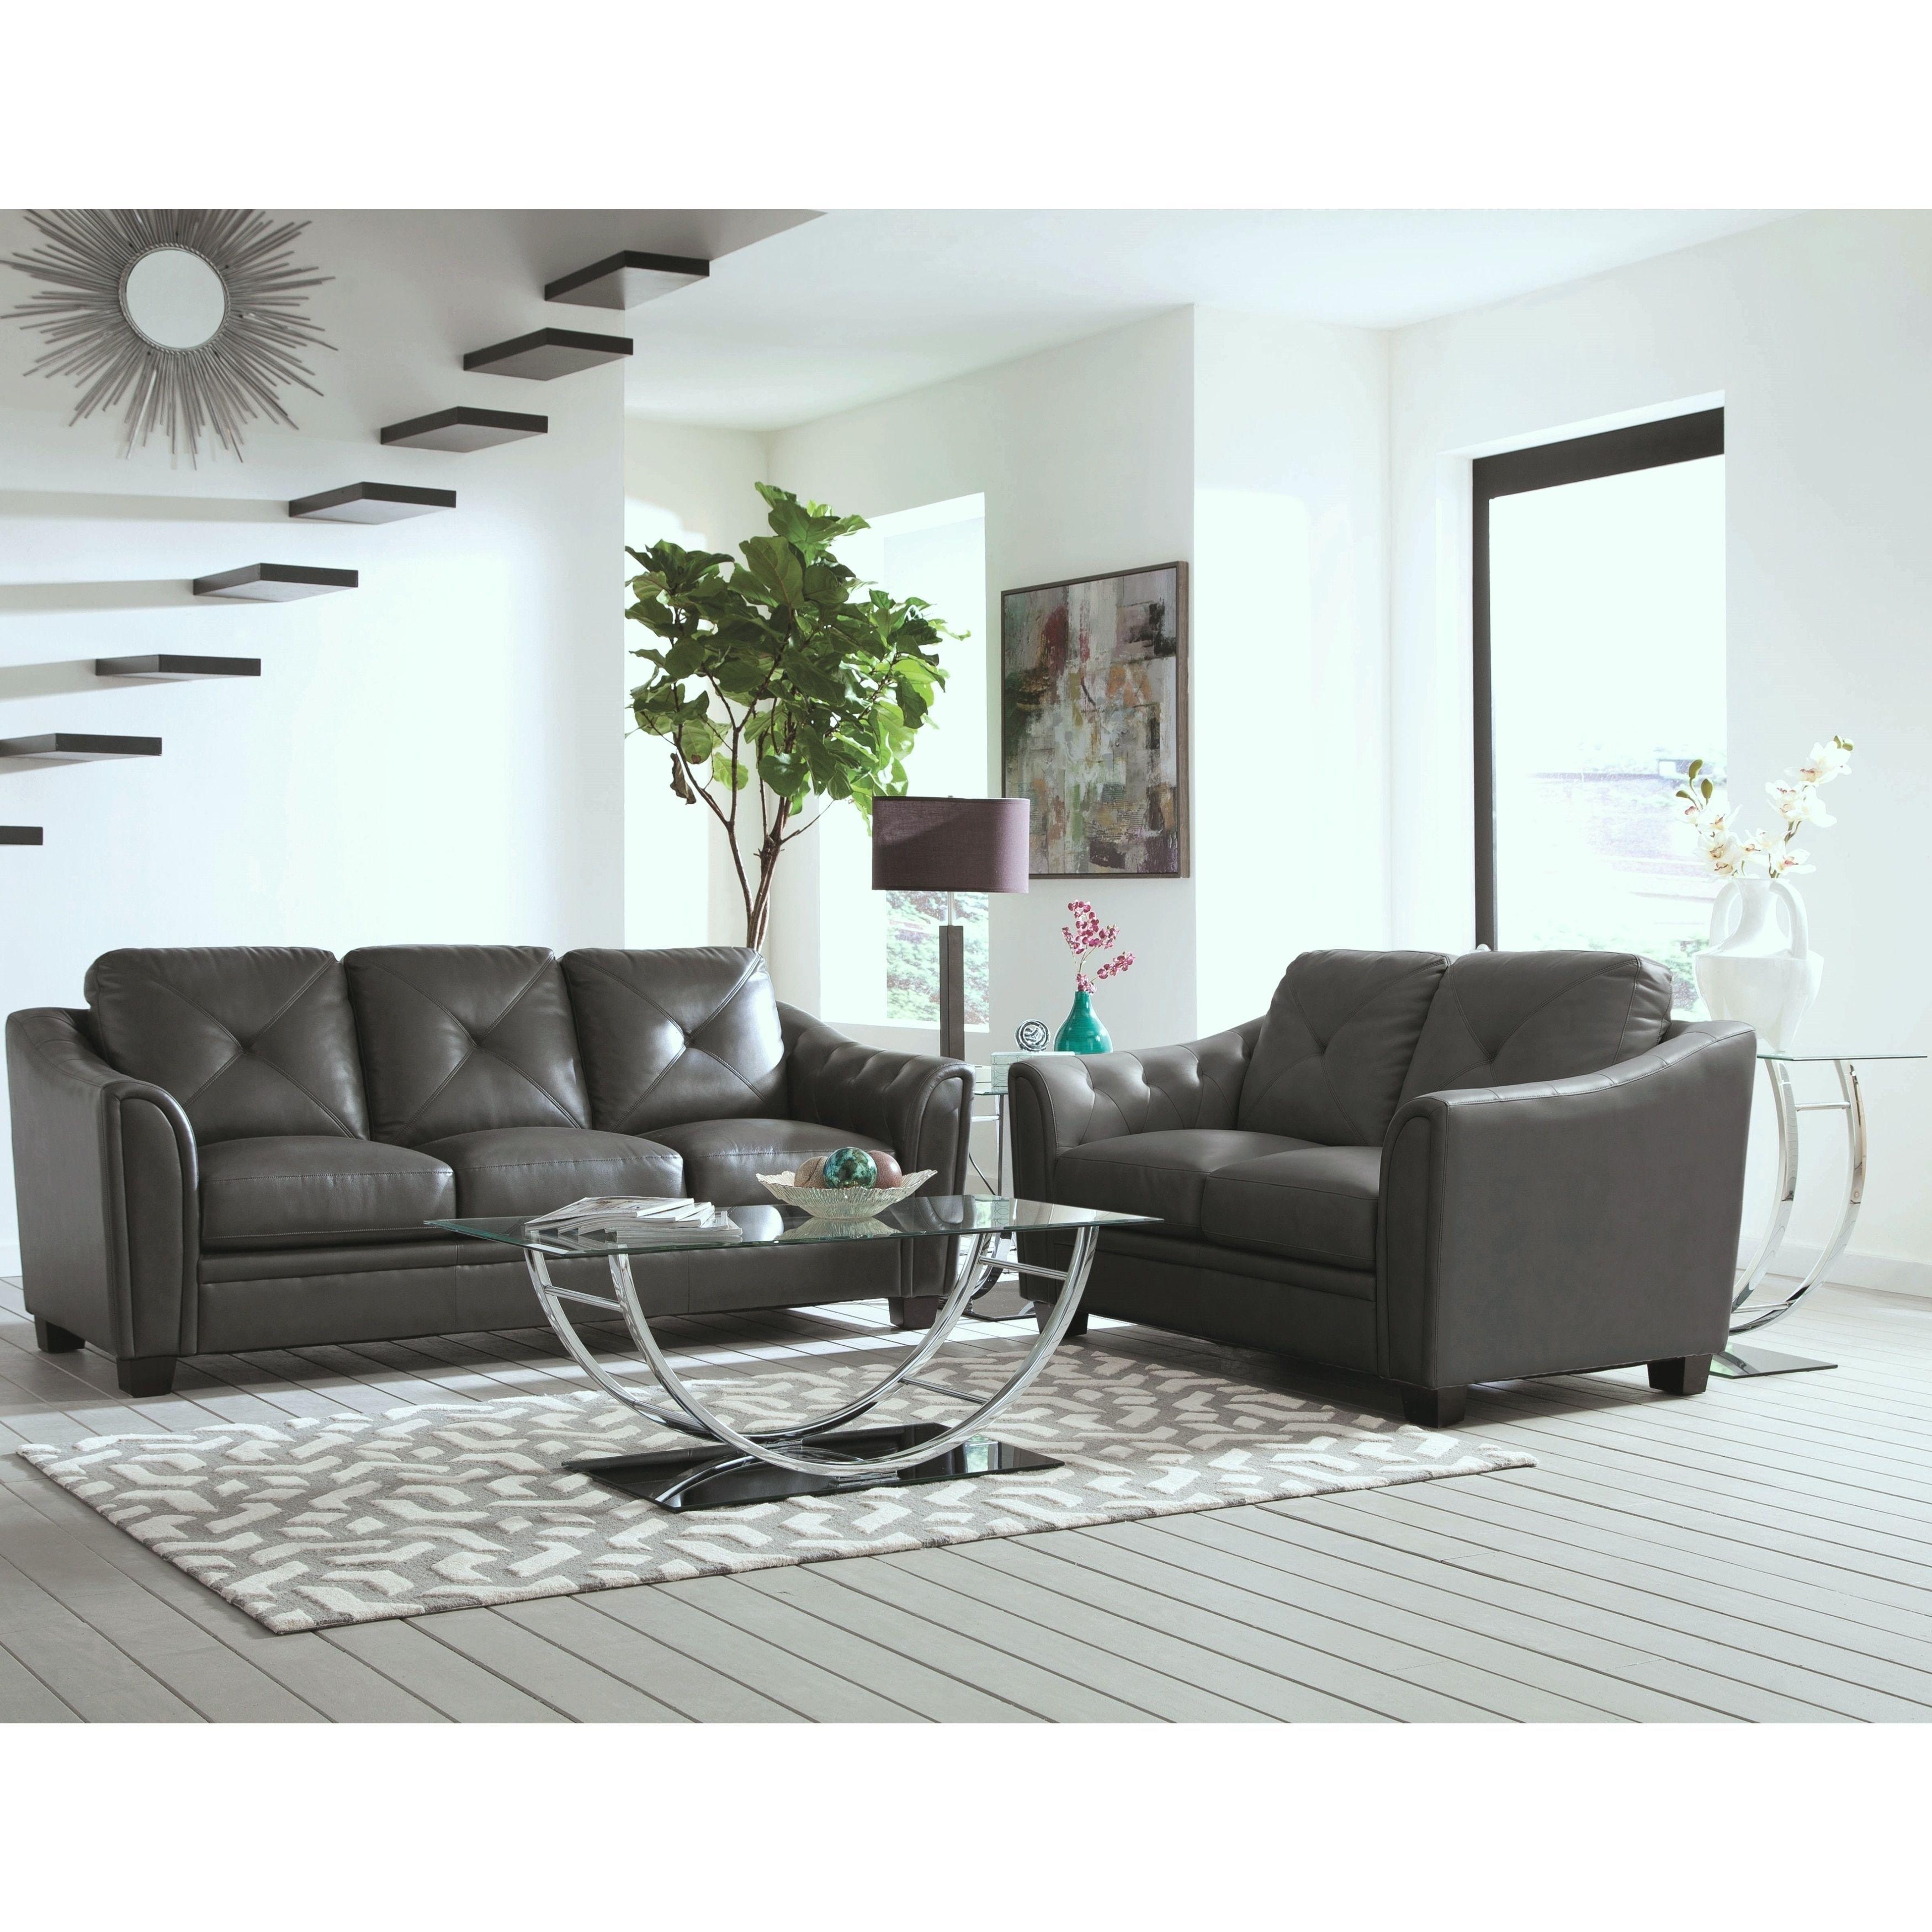 Marvelous Lacasta Mid Century Modern Tufted Design Living Room Sofa Pdpeps Interior Chair Design Pdpepsorg